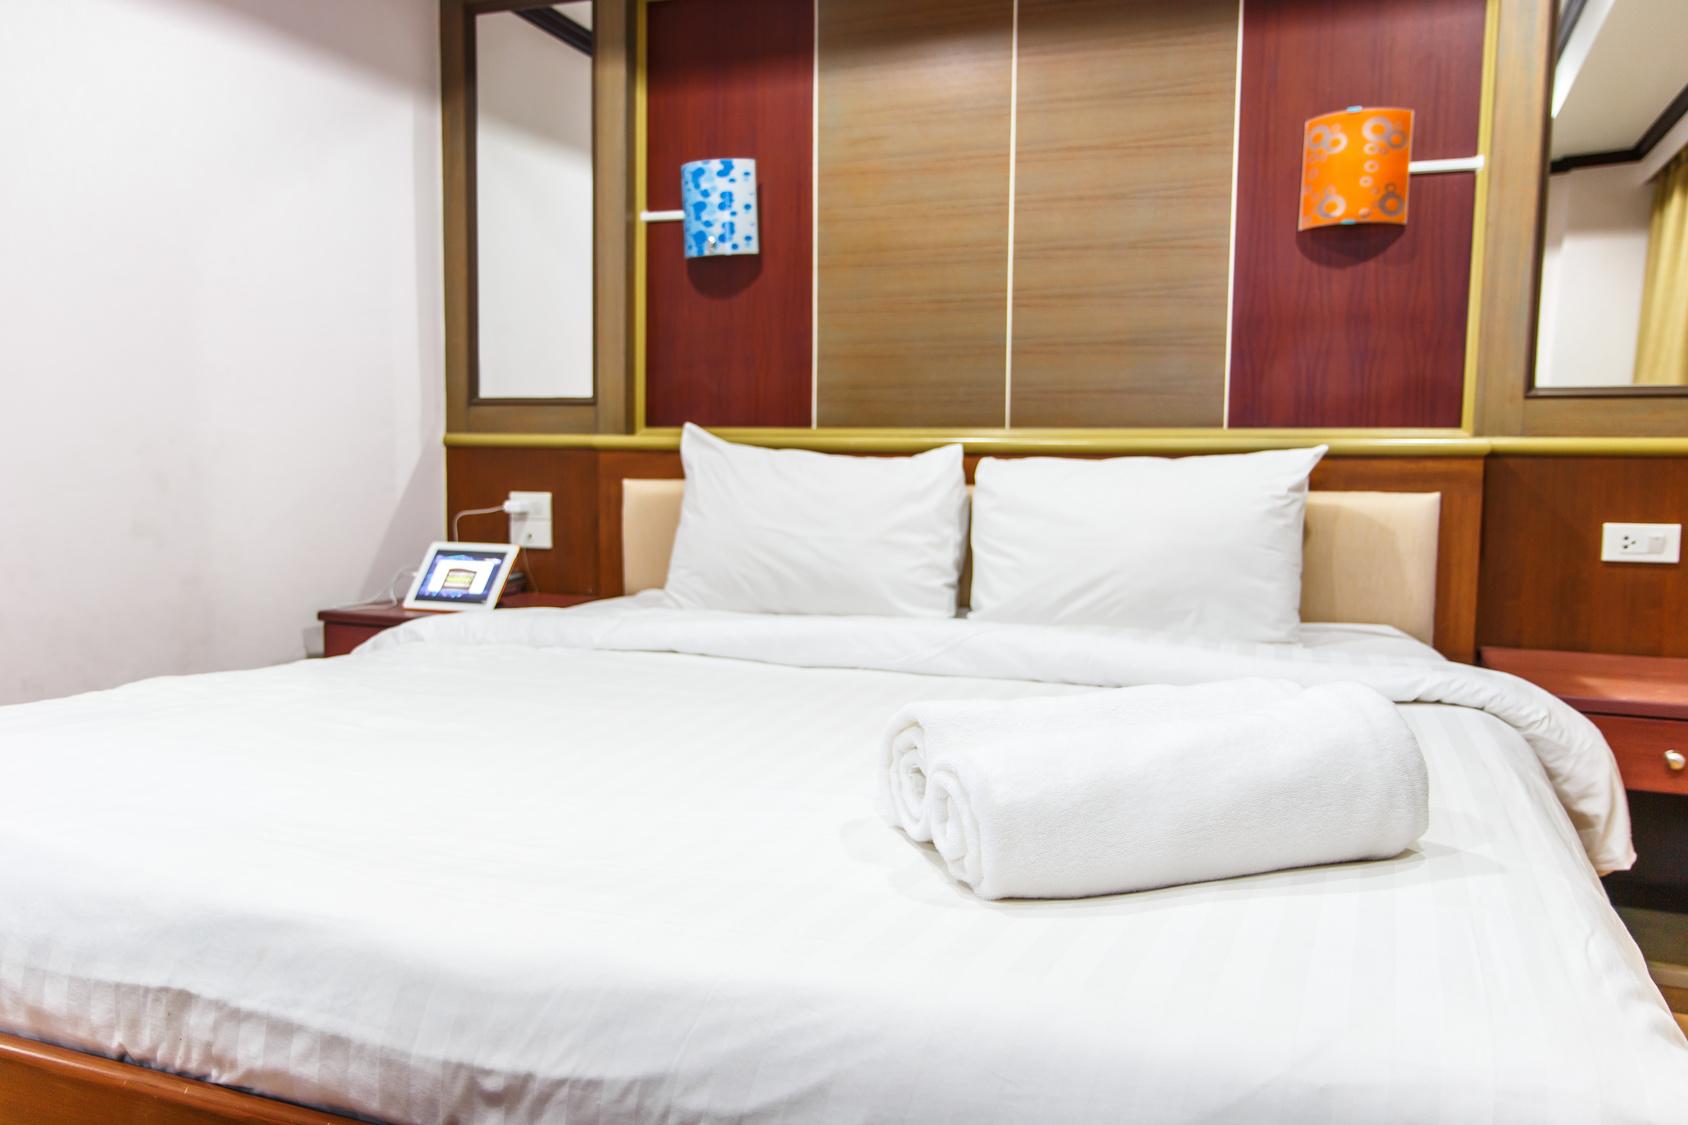 Hotel mala strana apartments warnhinweise bewertungen for Hotel mala strana